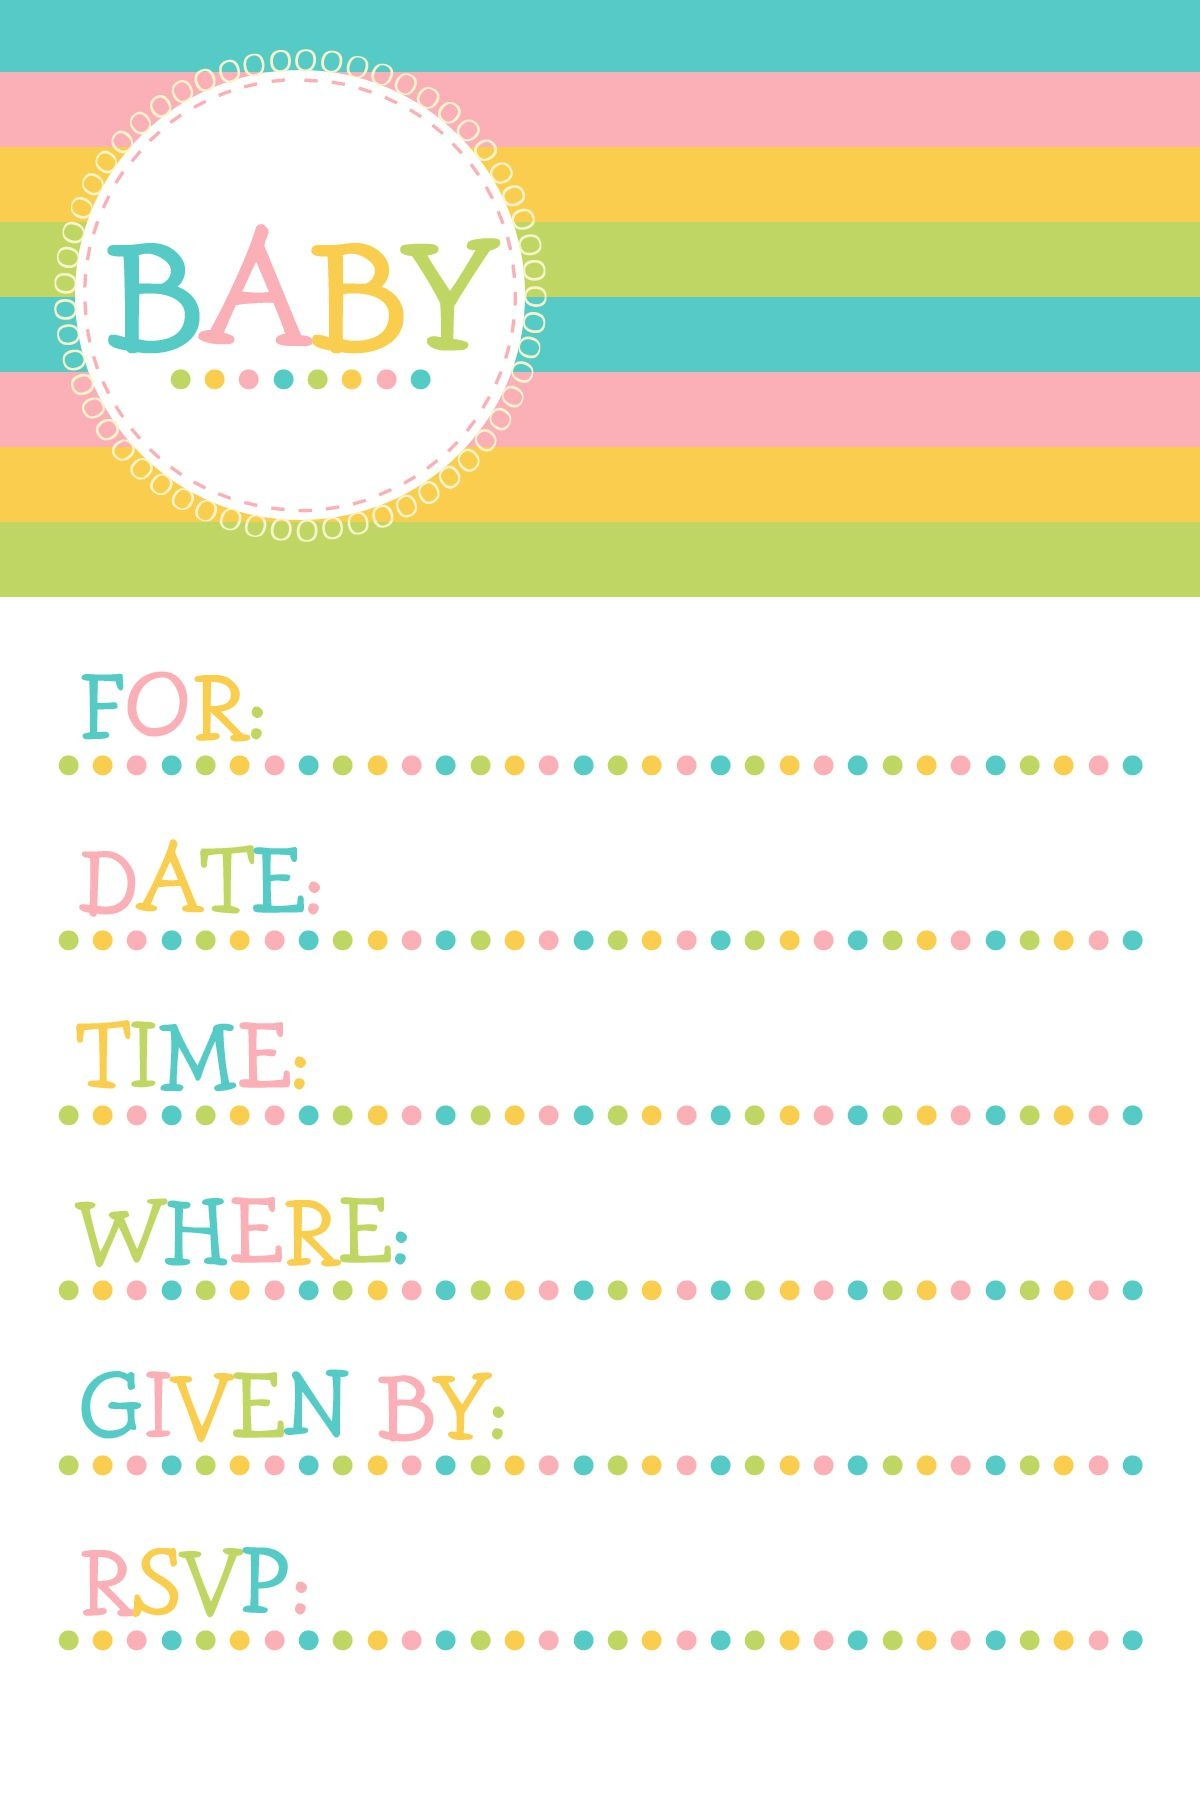 25 Adorable Free Printable Baby Shower Invitations - Baby Shower Templates Free Printable